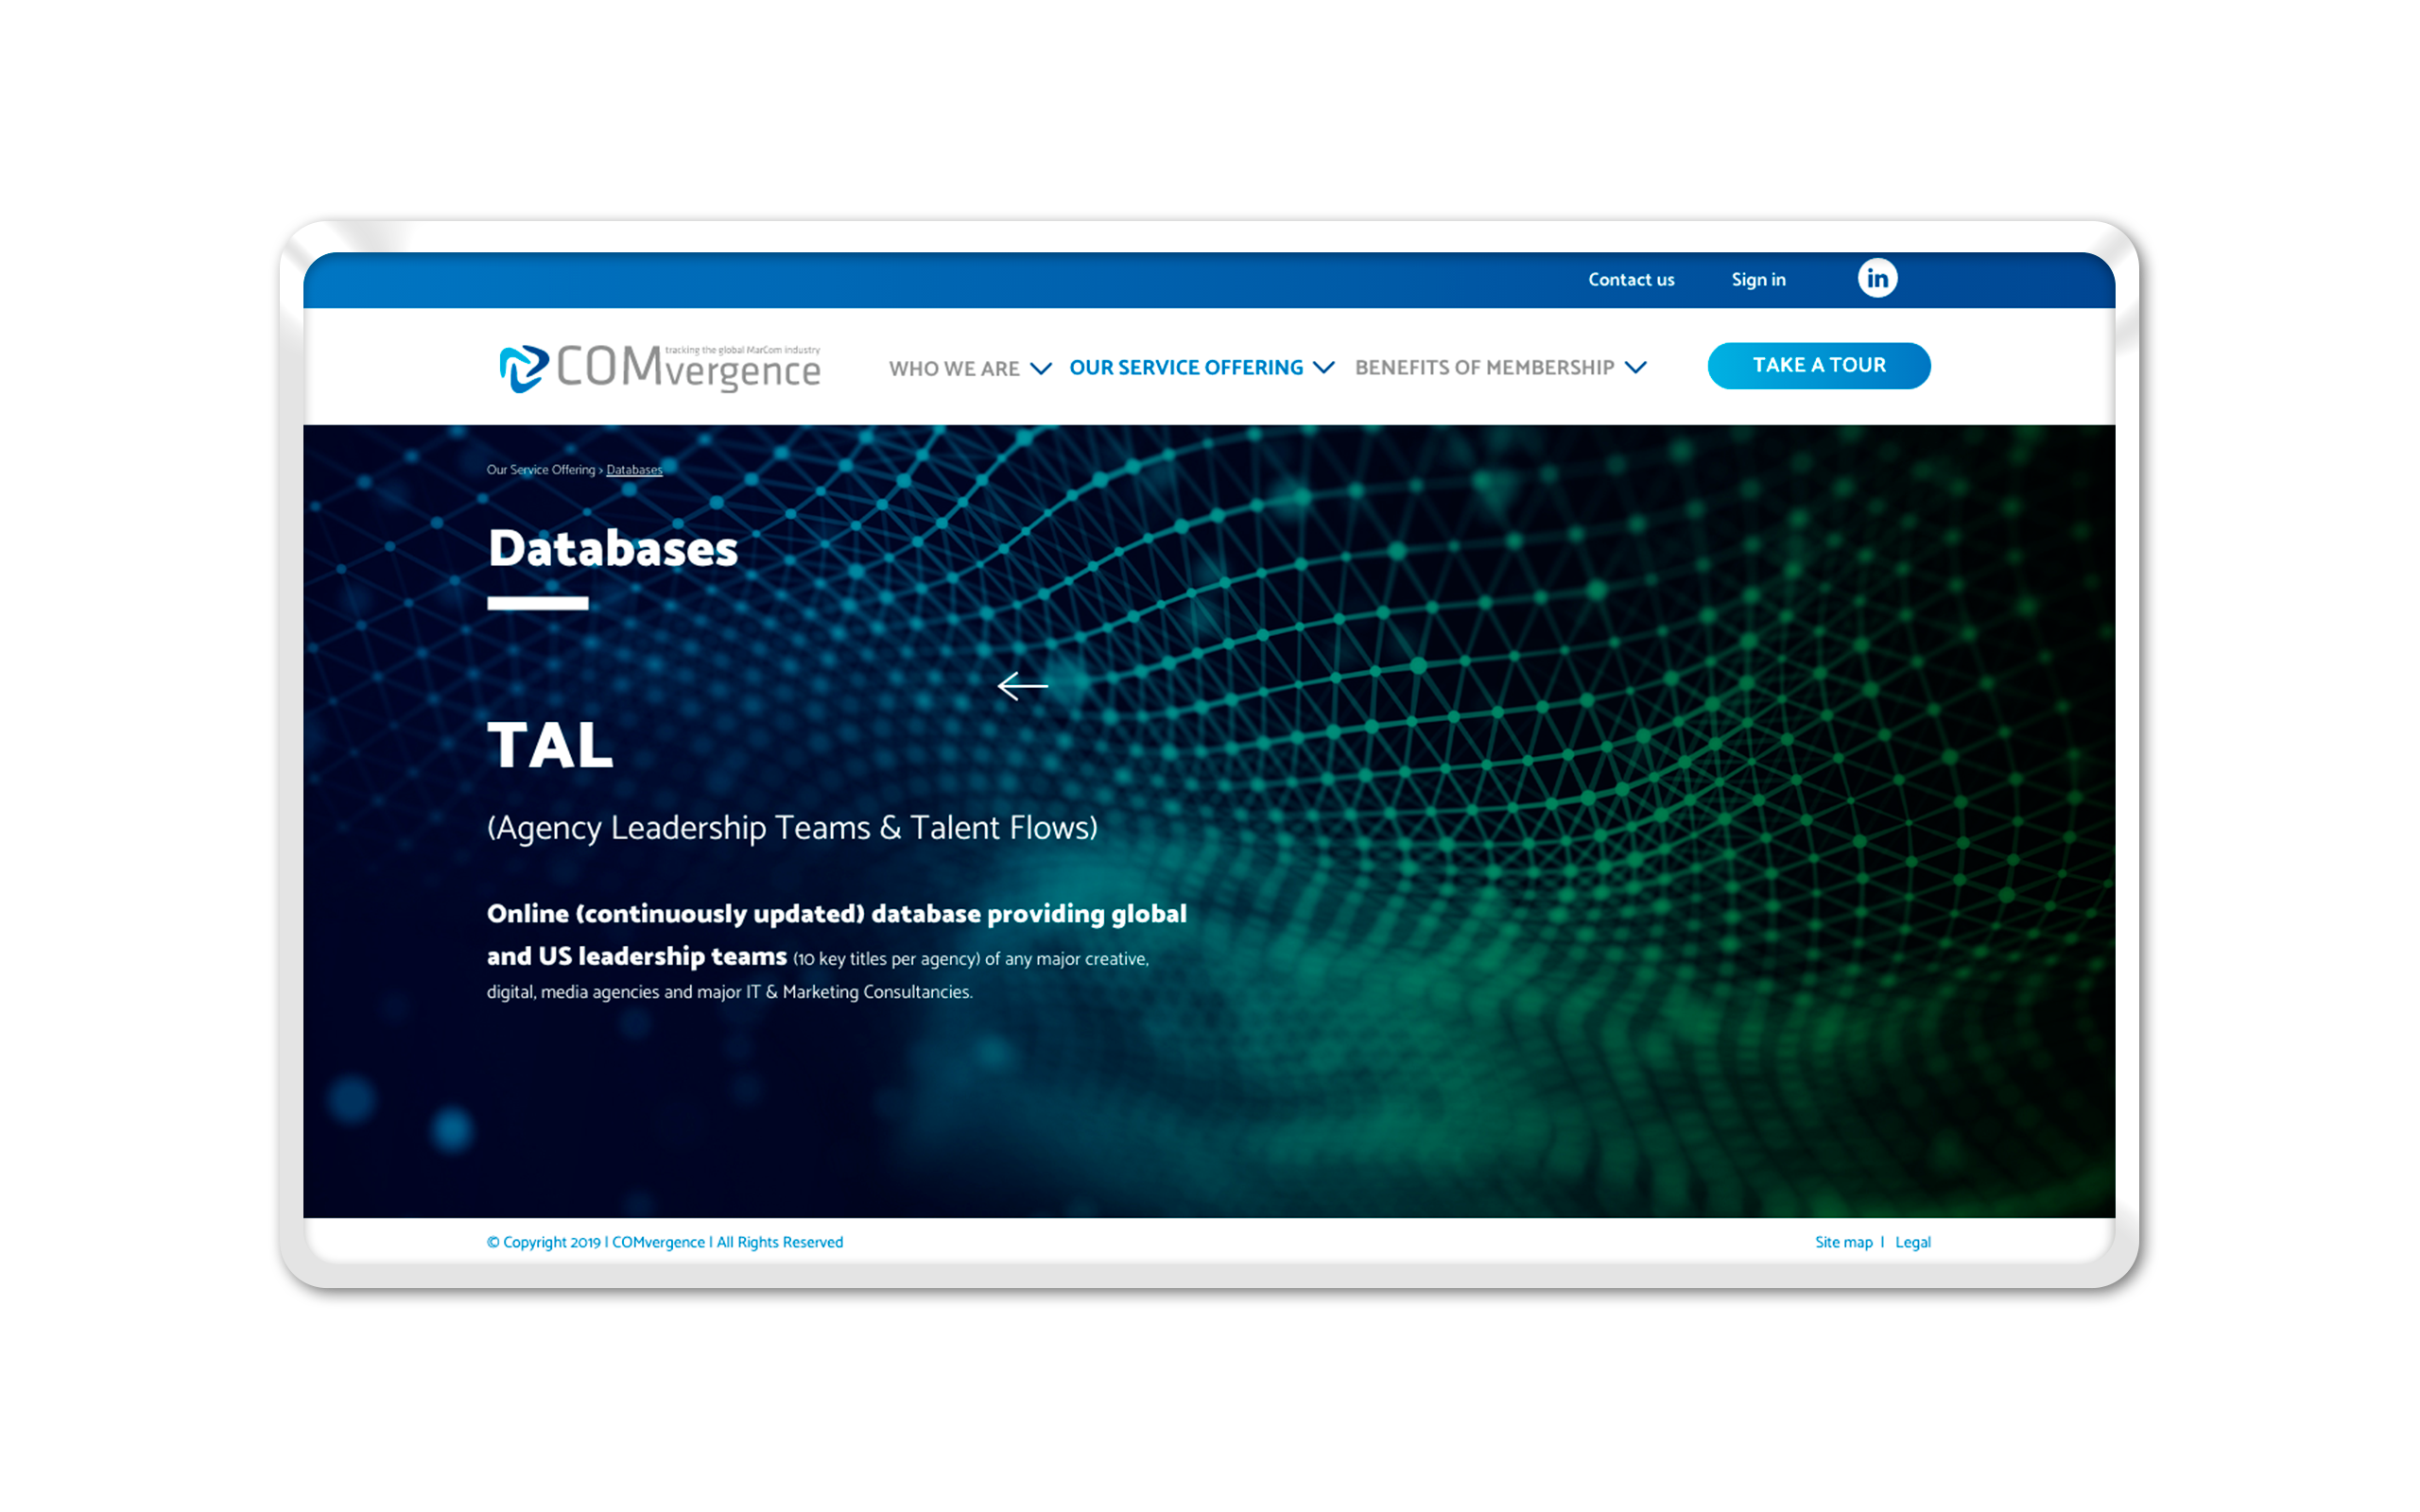 COMvergence WebSite